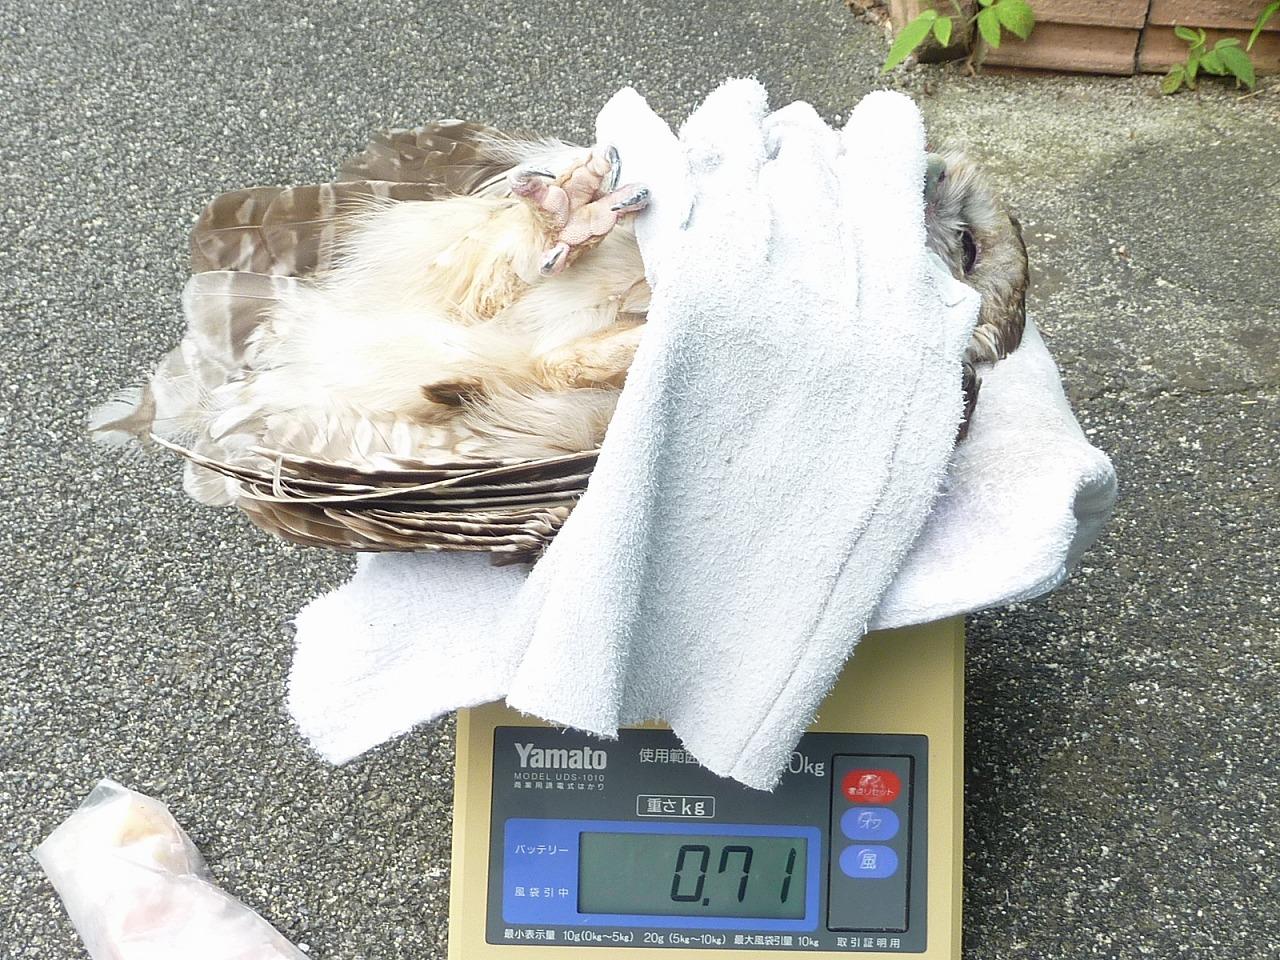 翔三朗の体重測定